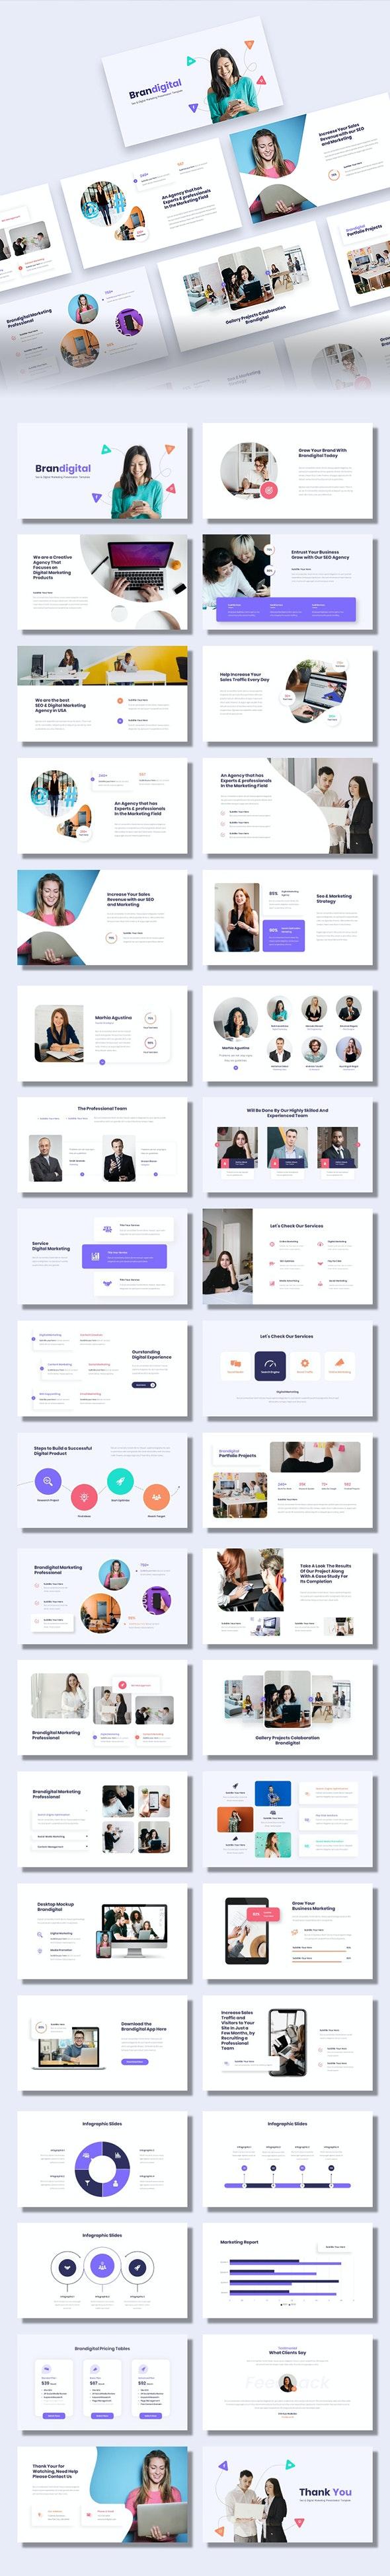 Brandigital - SEO & Digital Marketing Agency Google Slides Template